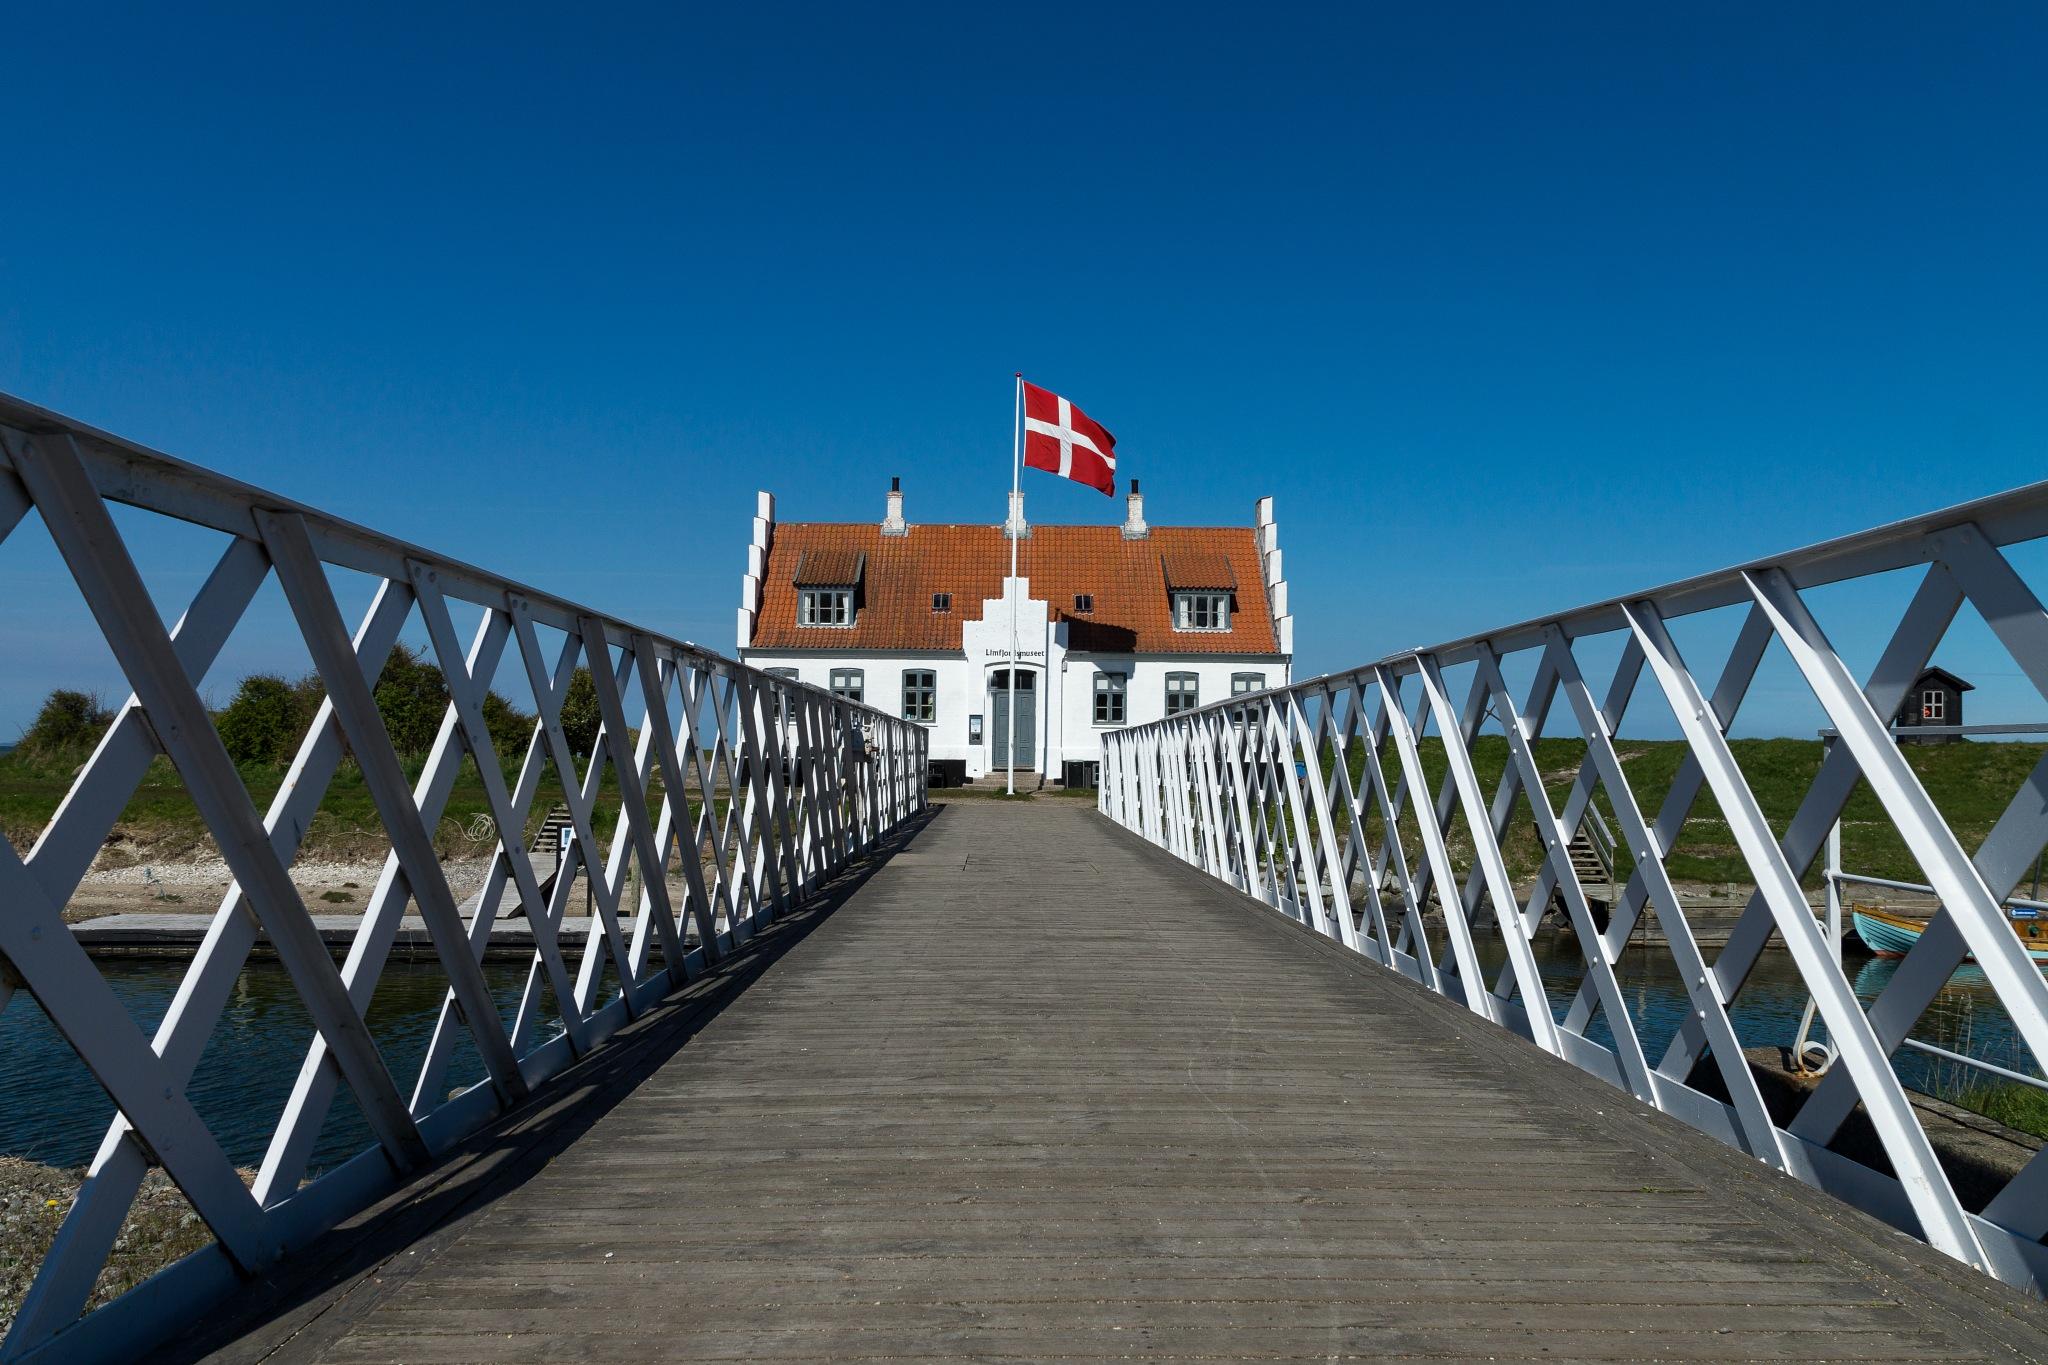 Limfjord Museum by Per Borring